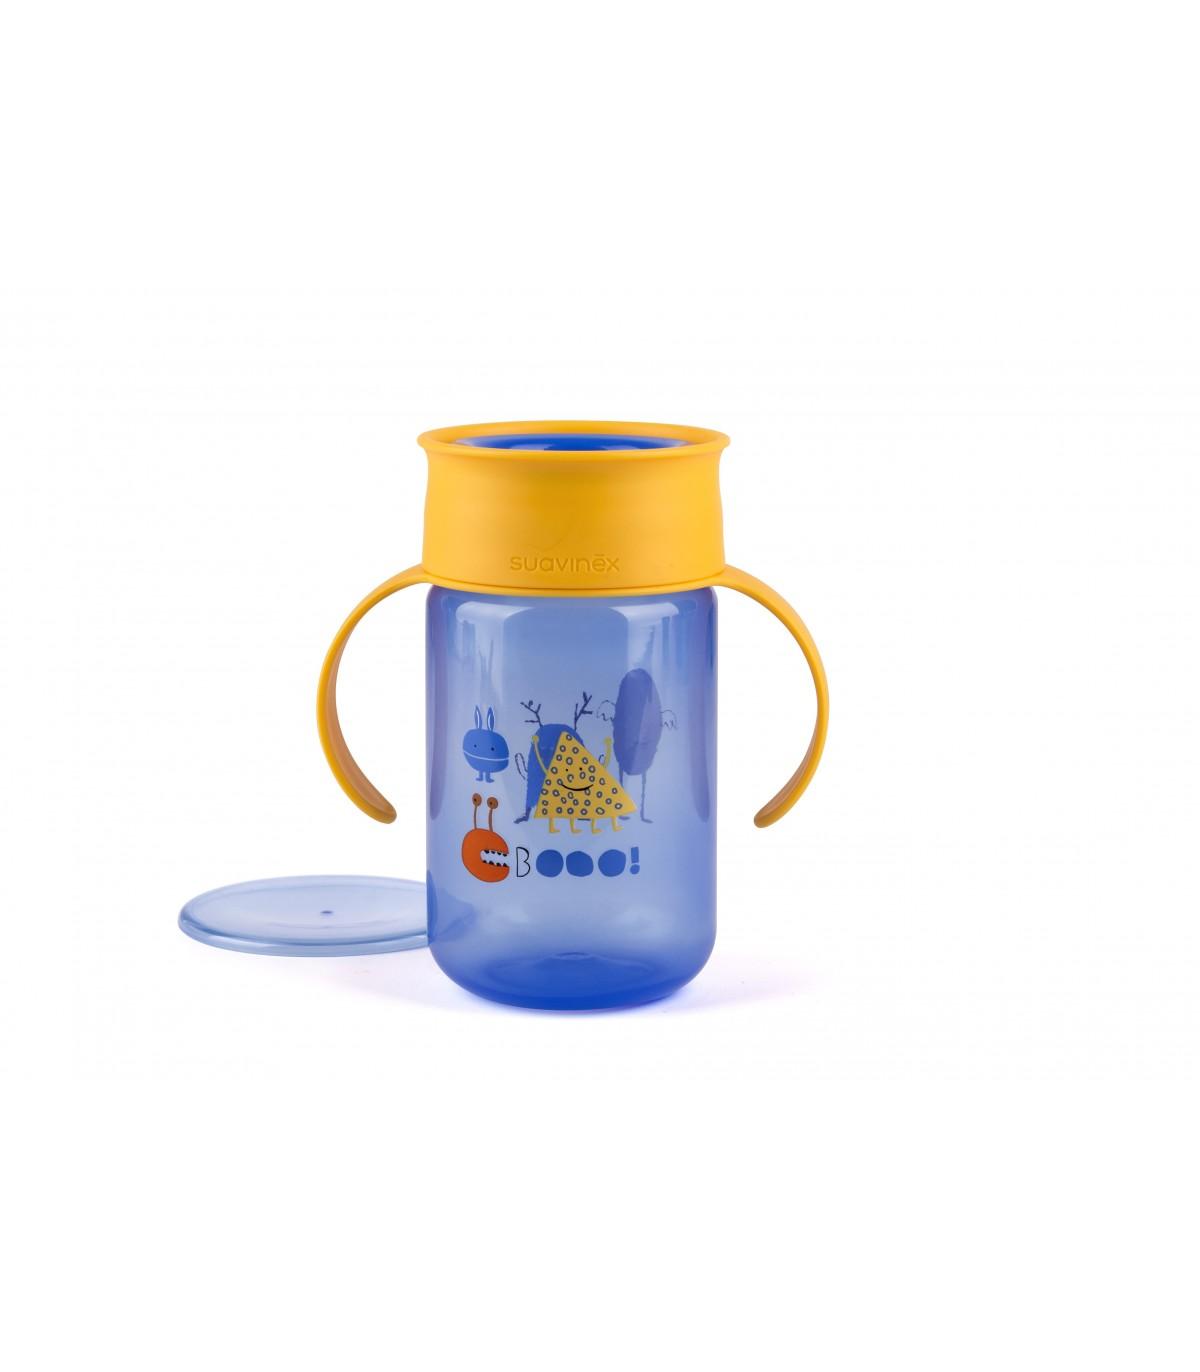 Suavinex Booo taza de aprendizaje con pajita azul 18/ Meses azul